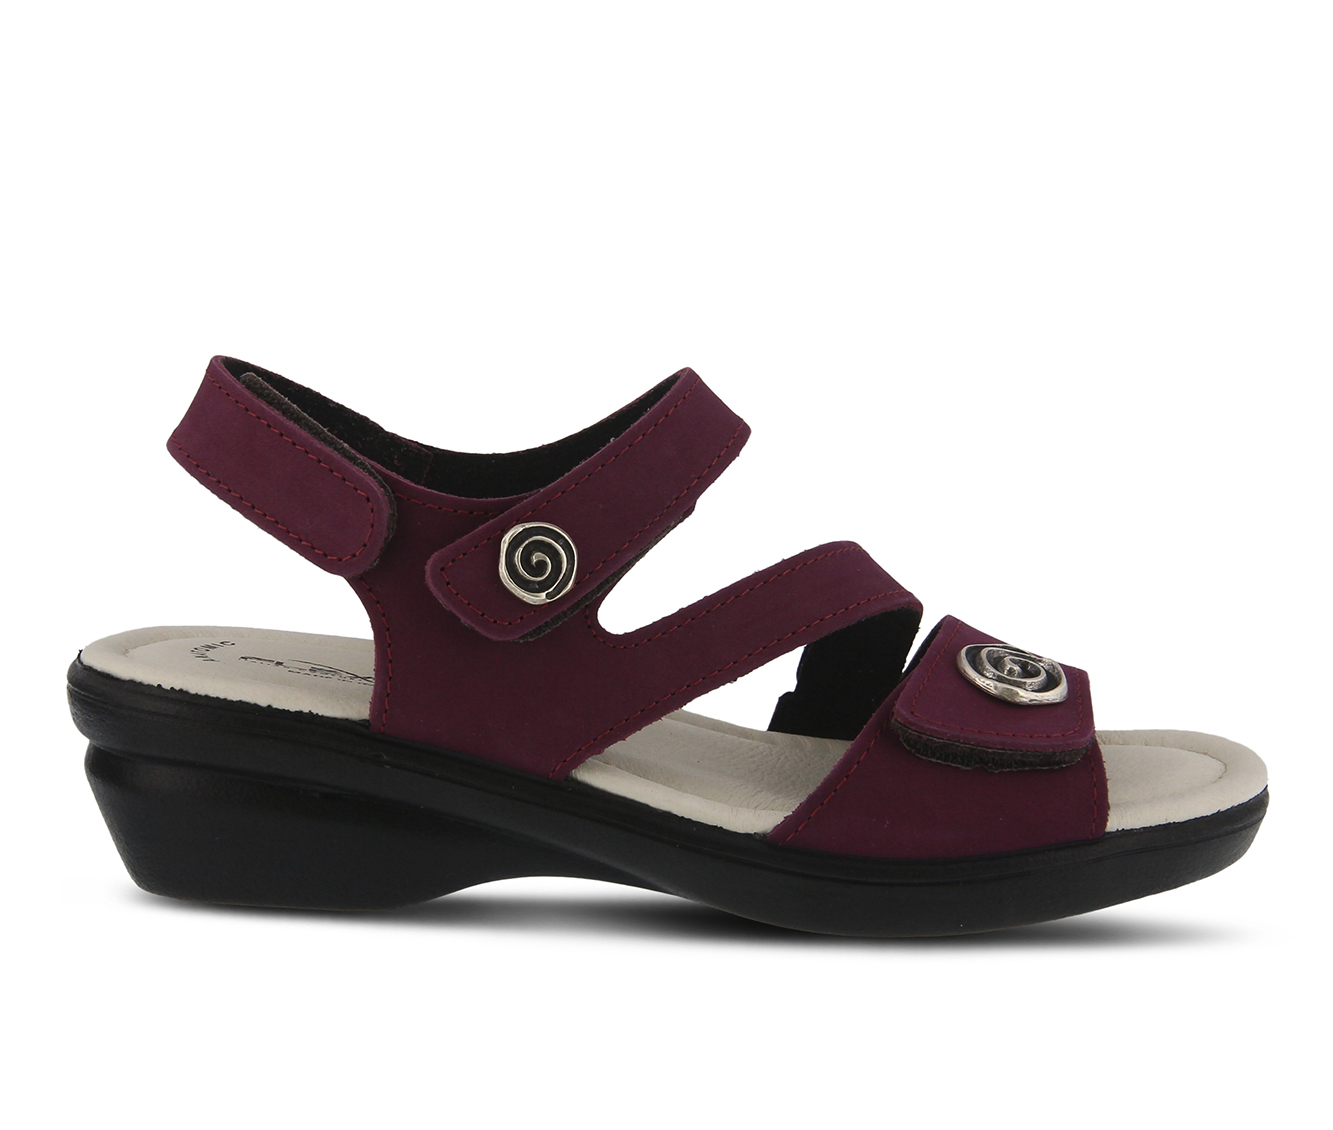 Flexus Safa Women's Sandal (Purple Leather)